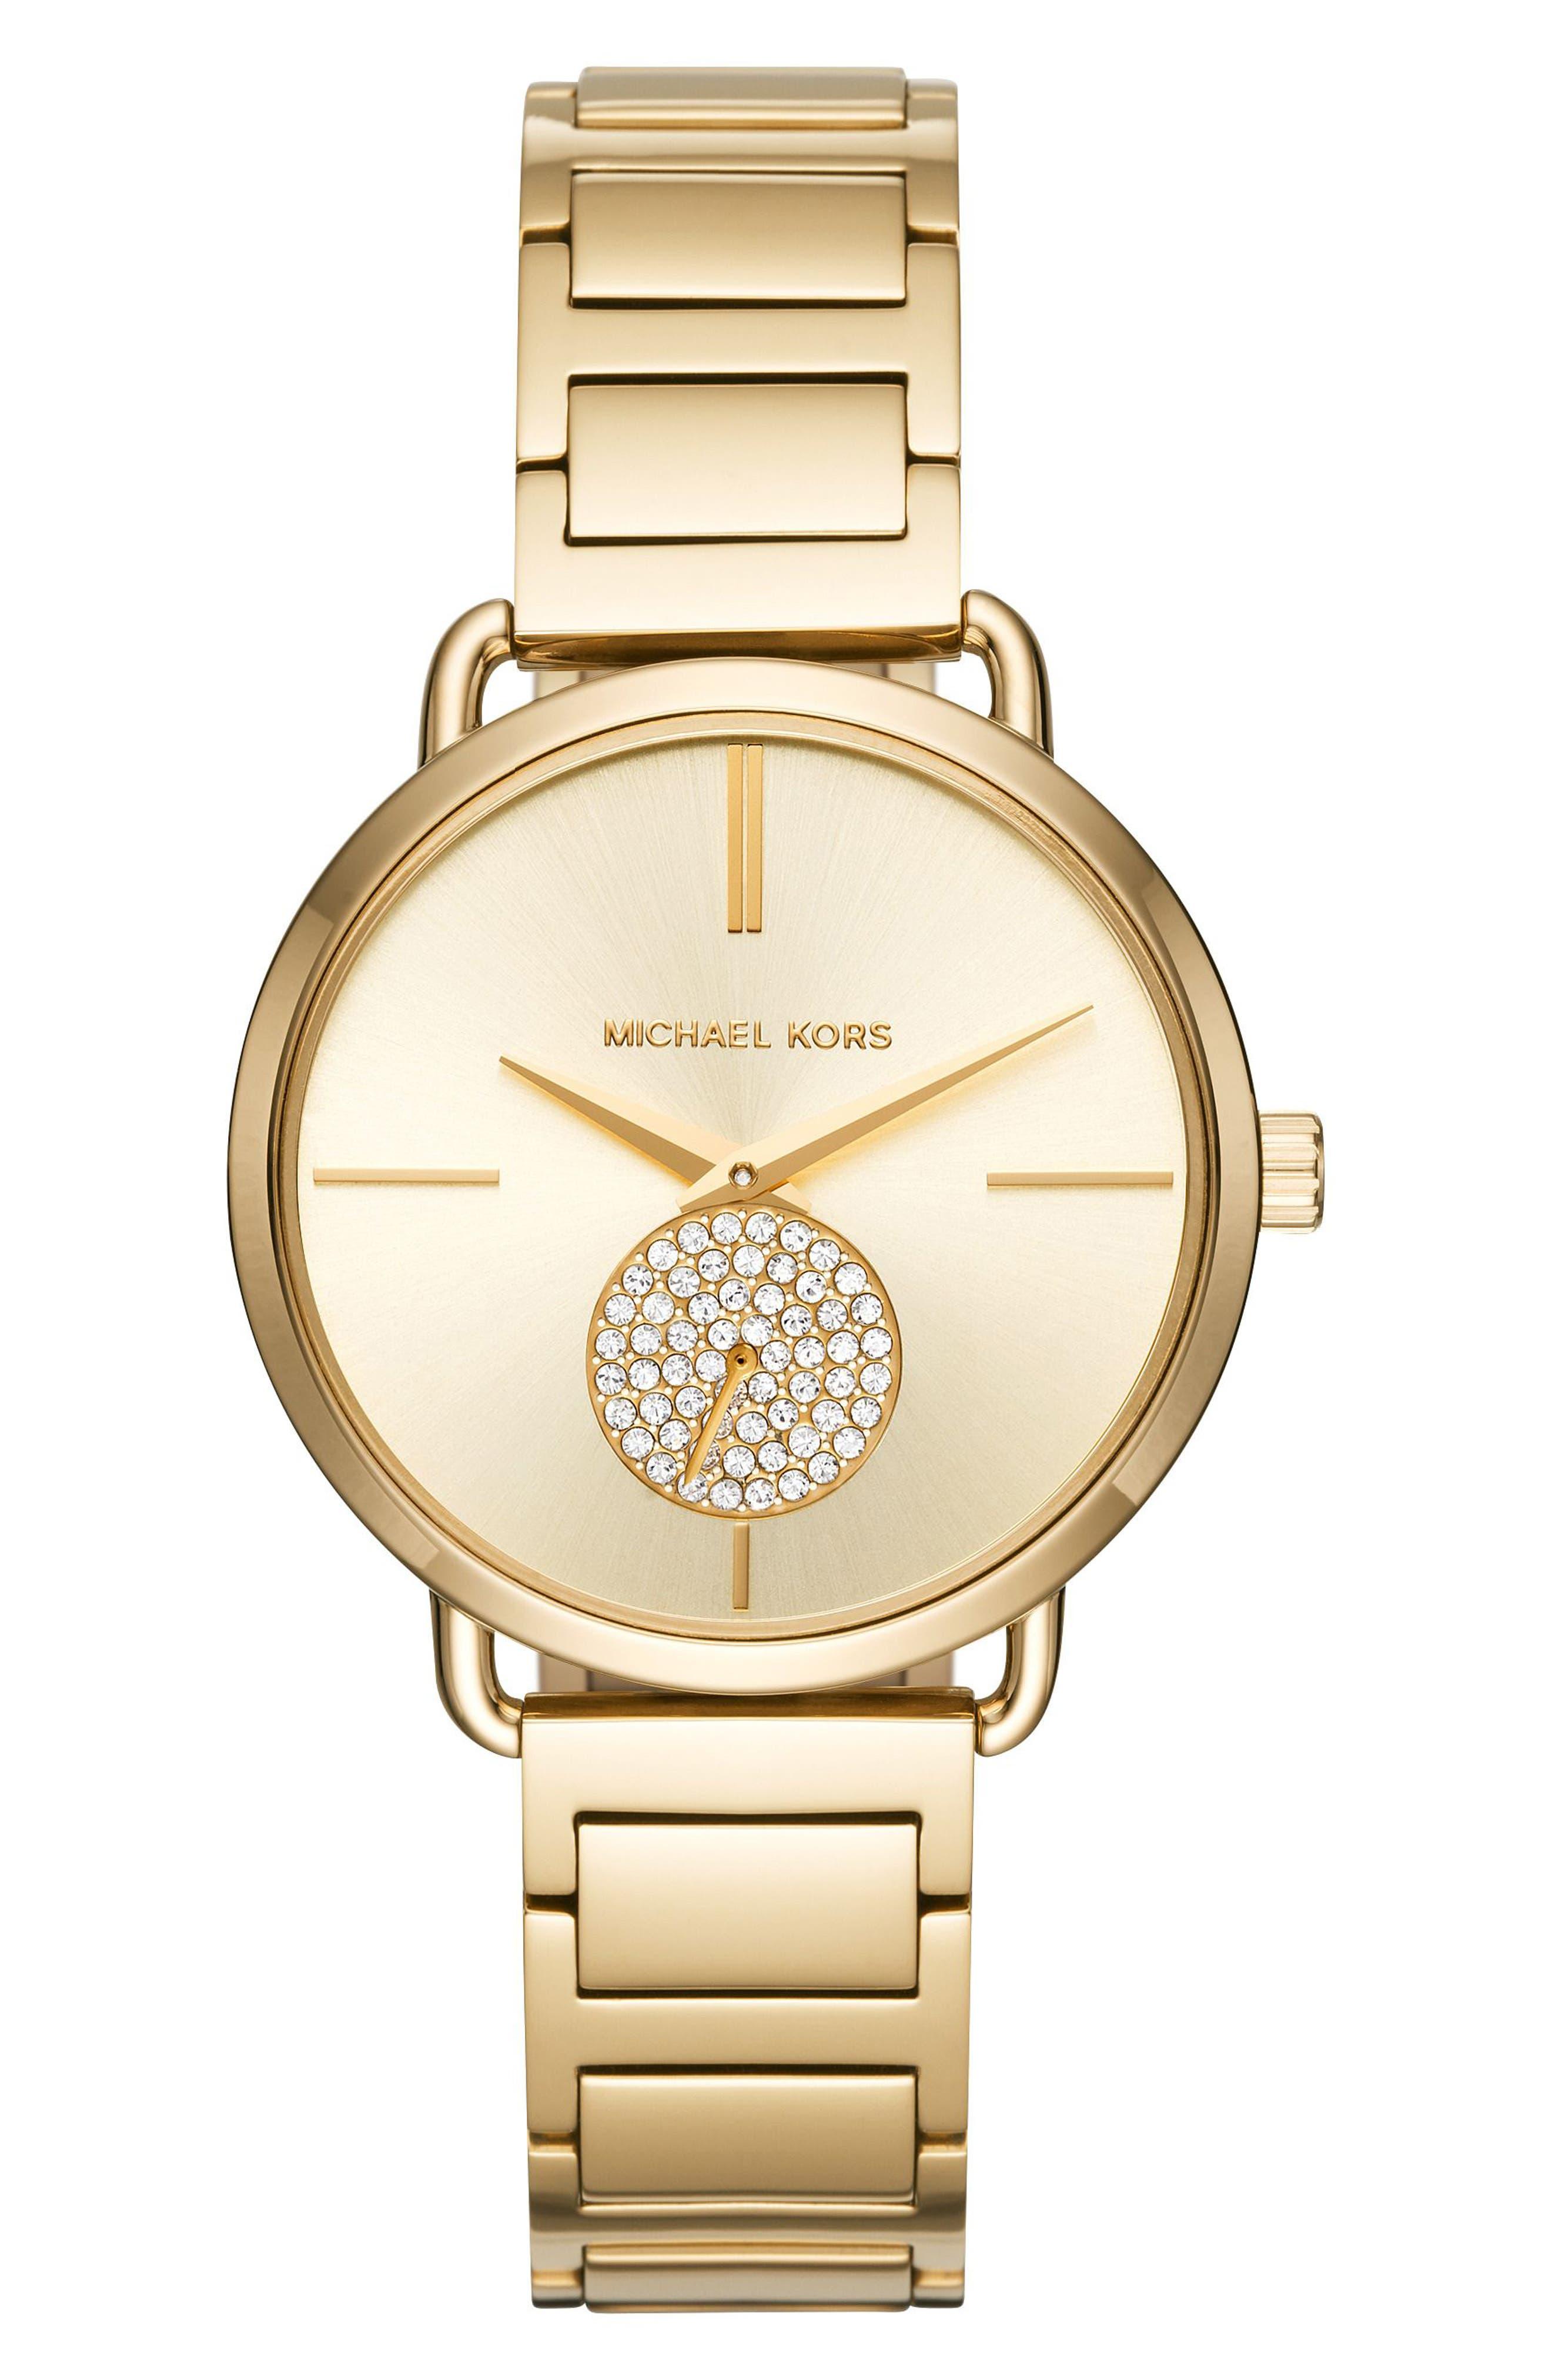 MICHAEL KORS MICHAEL Michael Kors Portia Round Bracelet Watch, 36.5mm